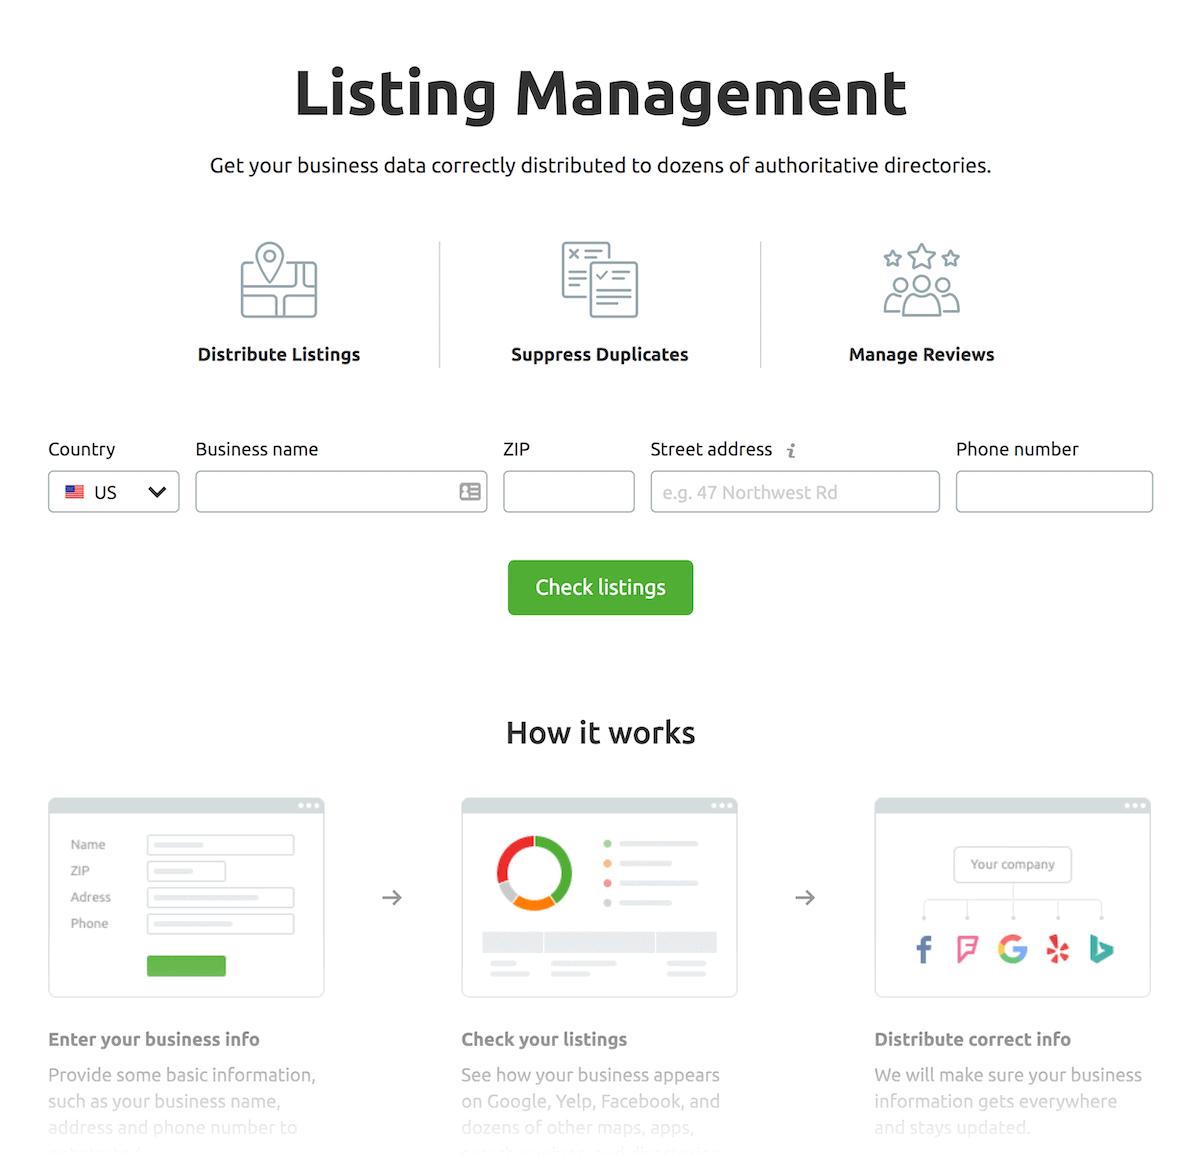 SEMrush – Listing management